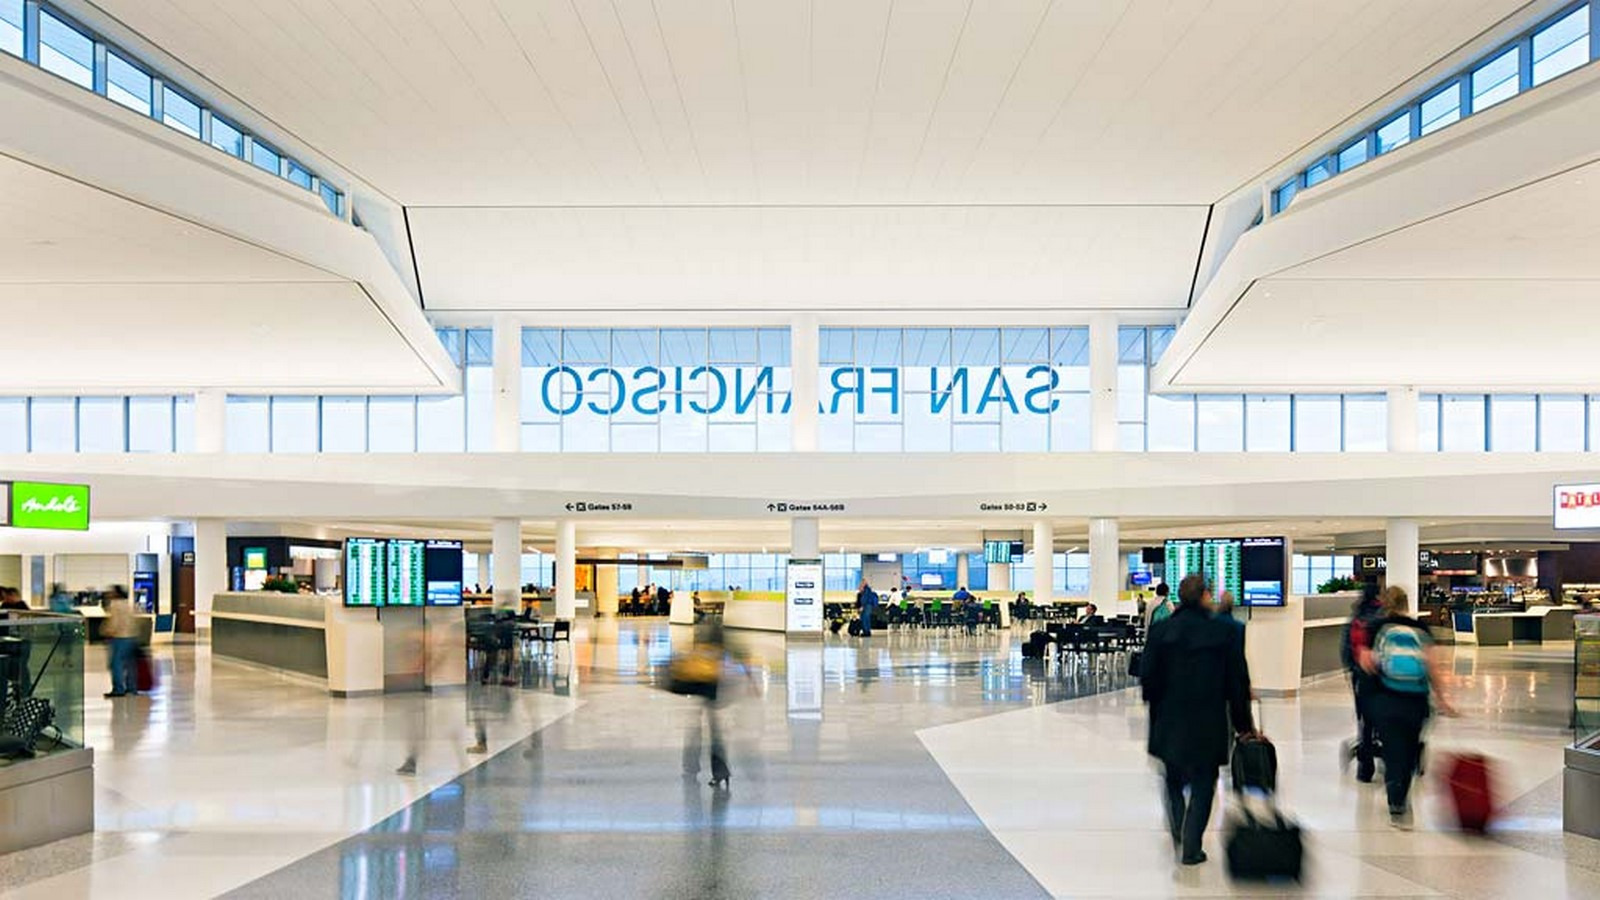 Terminal 2 - San Francisco International Airport - Sheet5